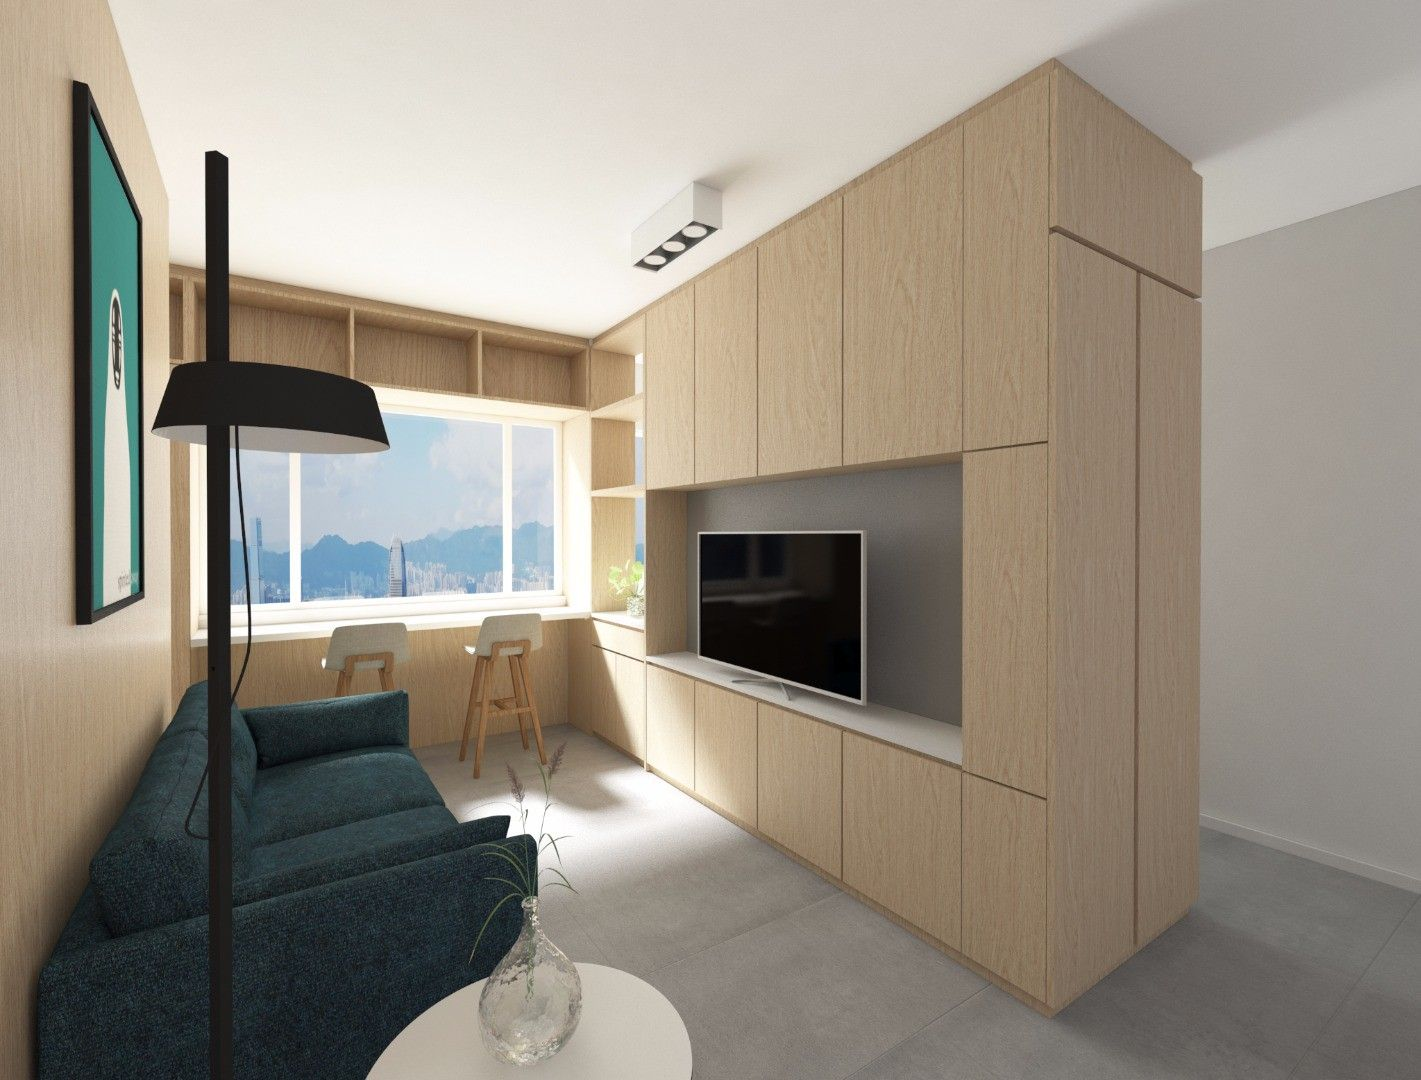 Home interior design hong kong diy small home decor residential interior design hong kong